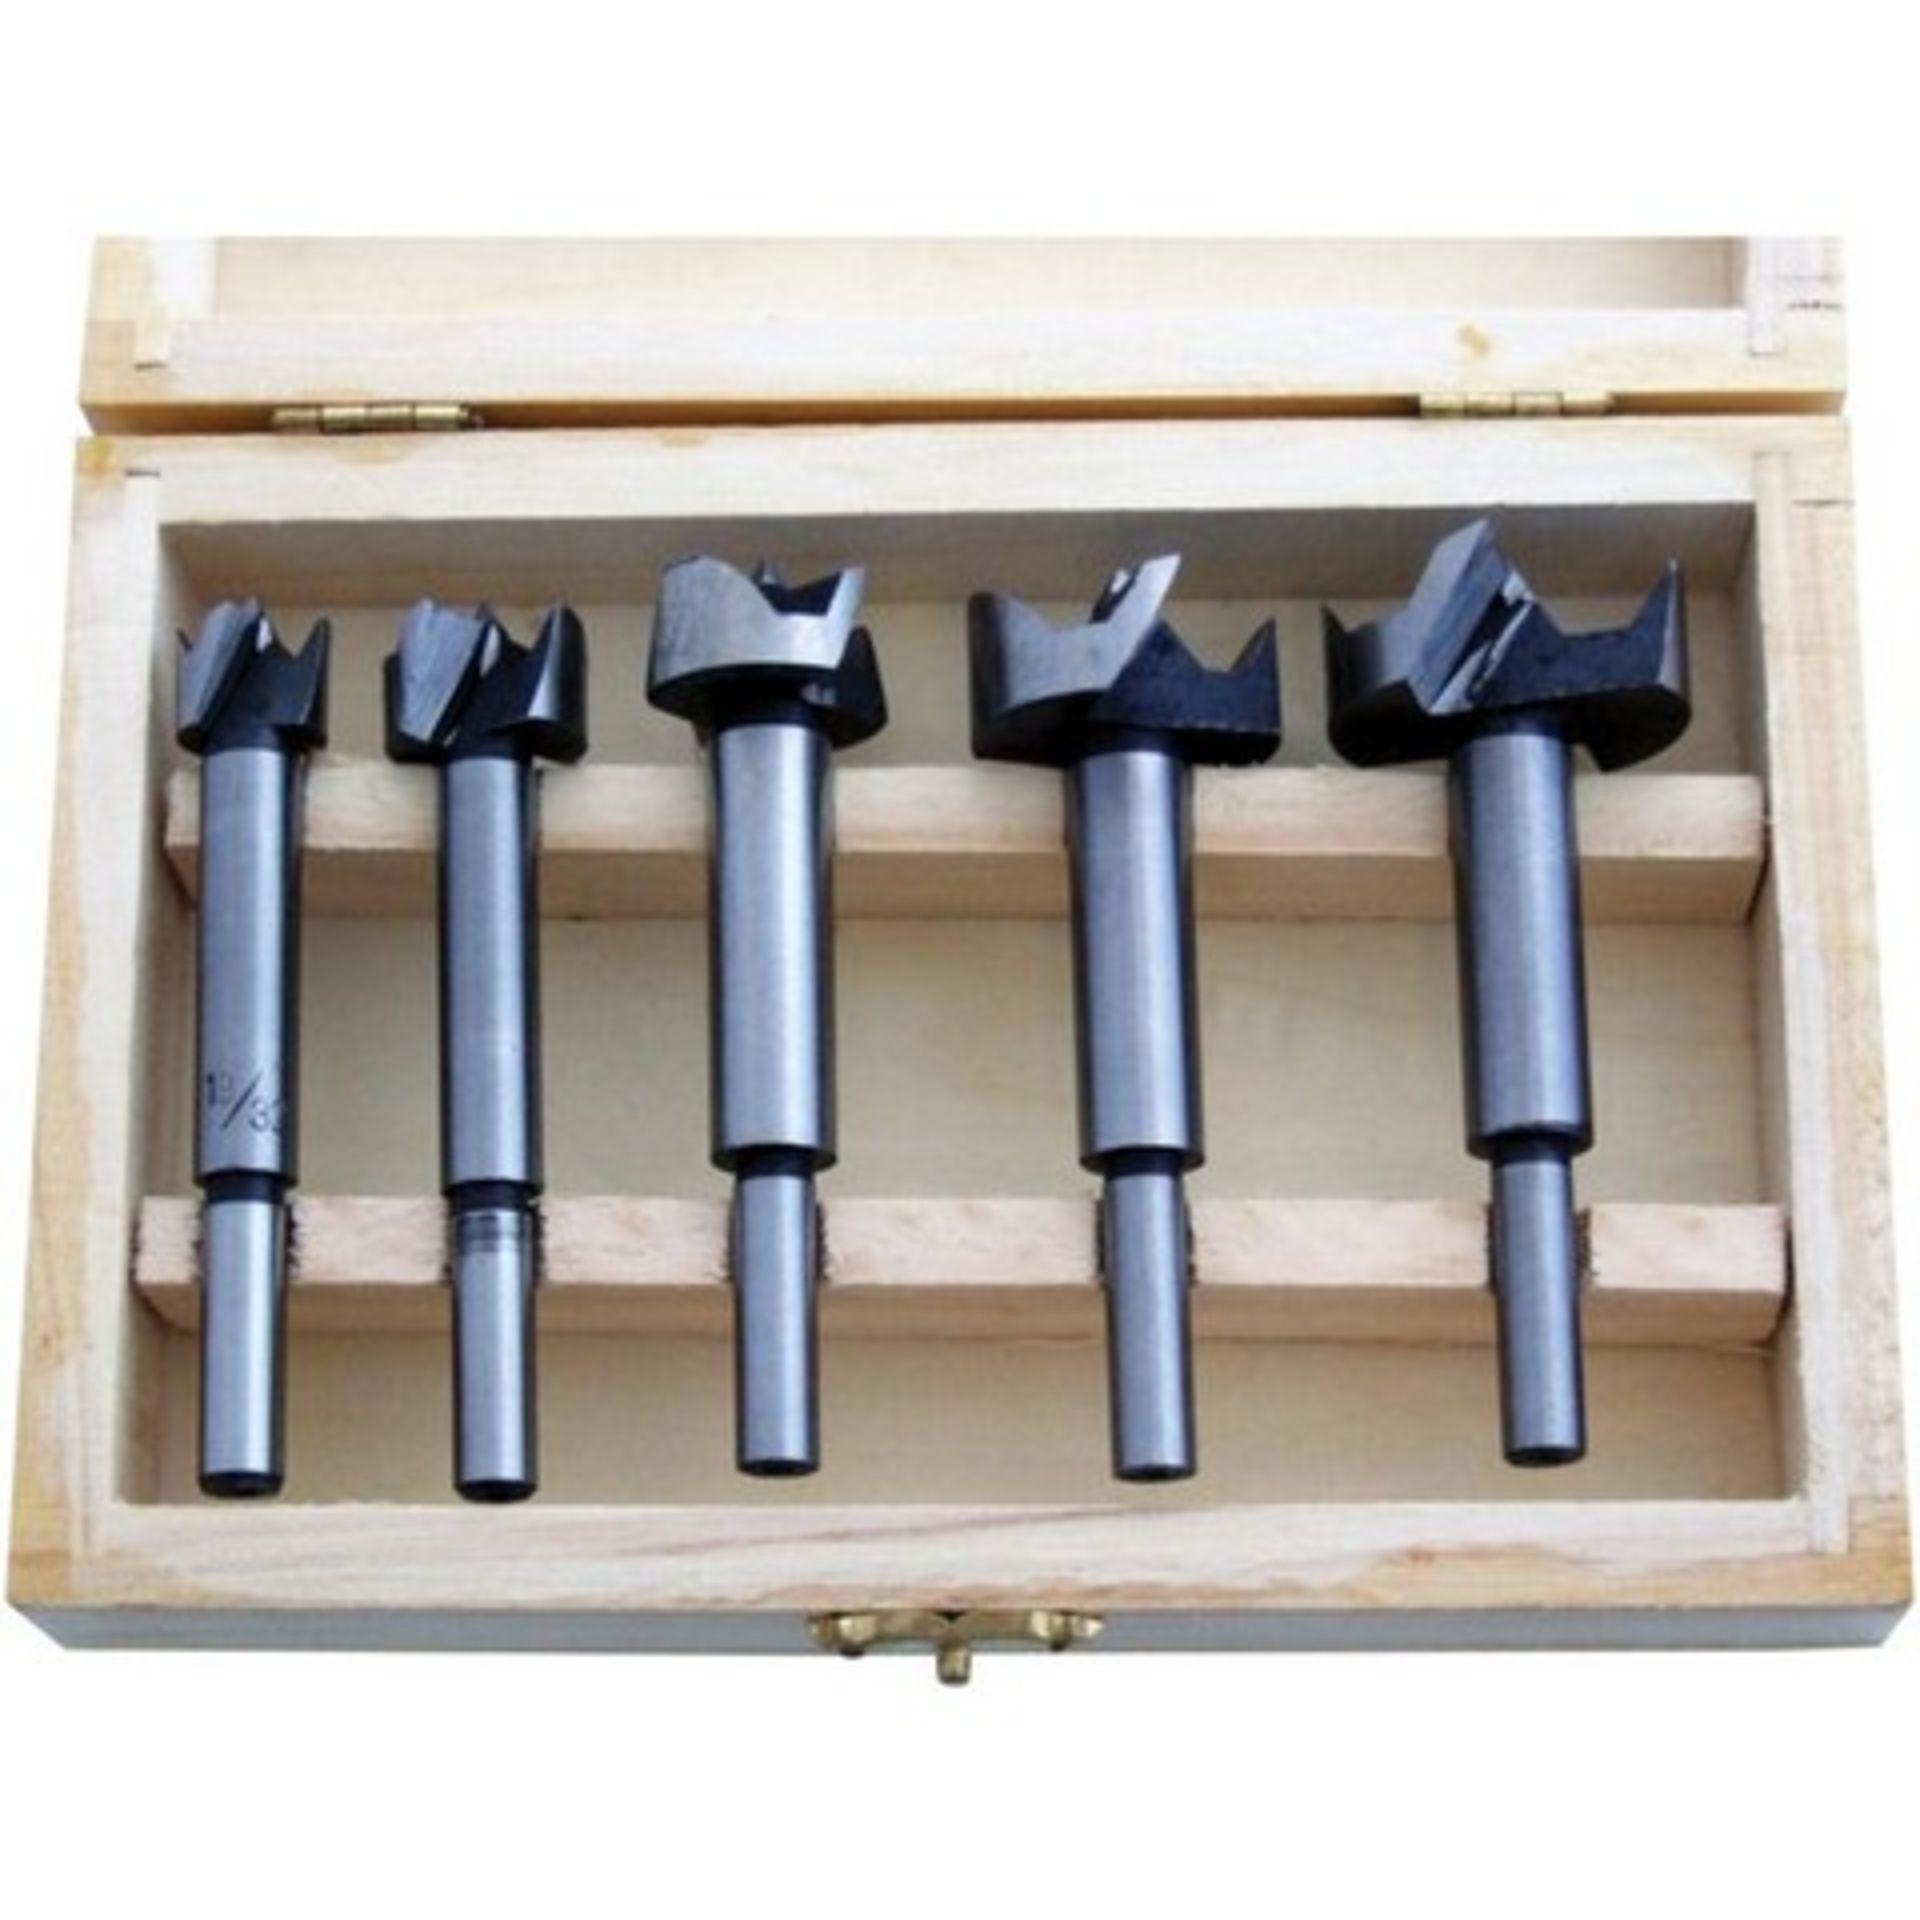 Lot 12514 - V Brand New 5 Piece Forstner Bit Set In Wooden Case